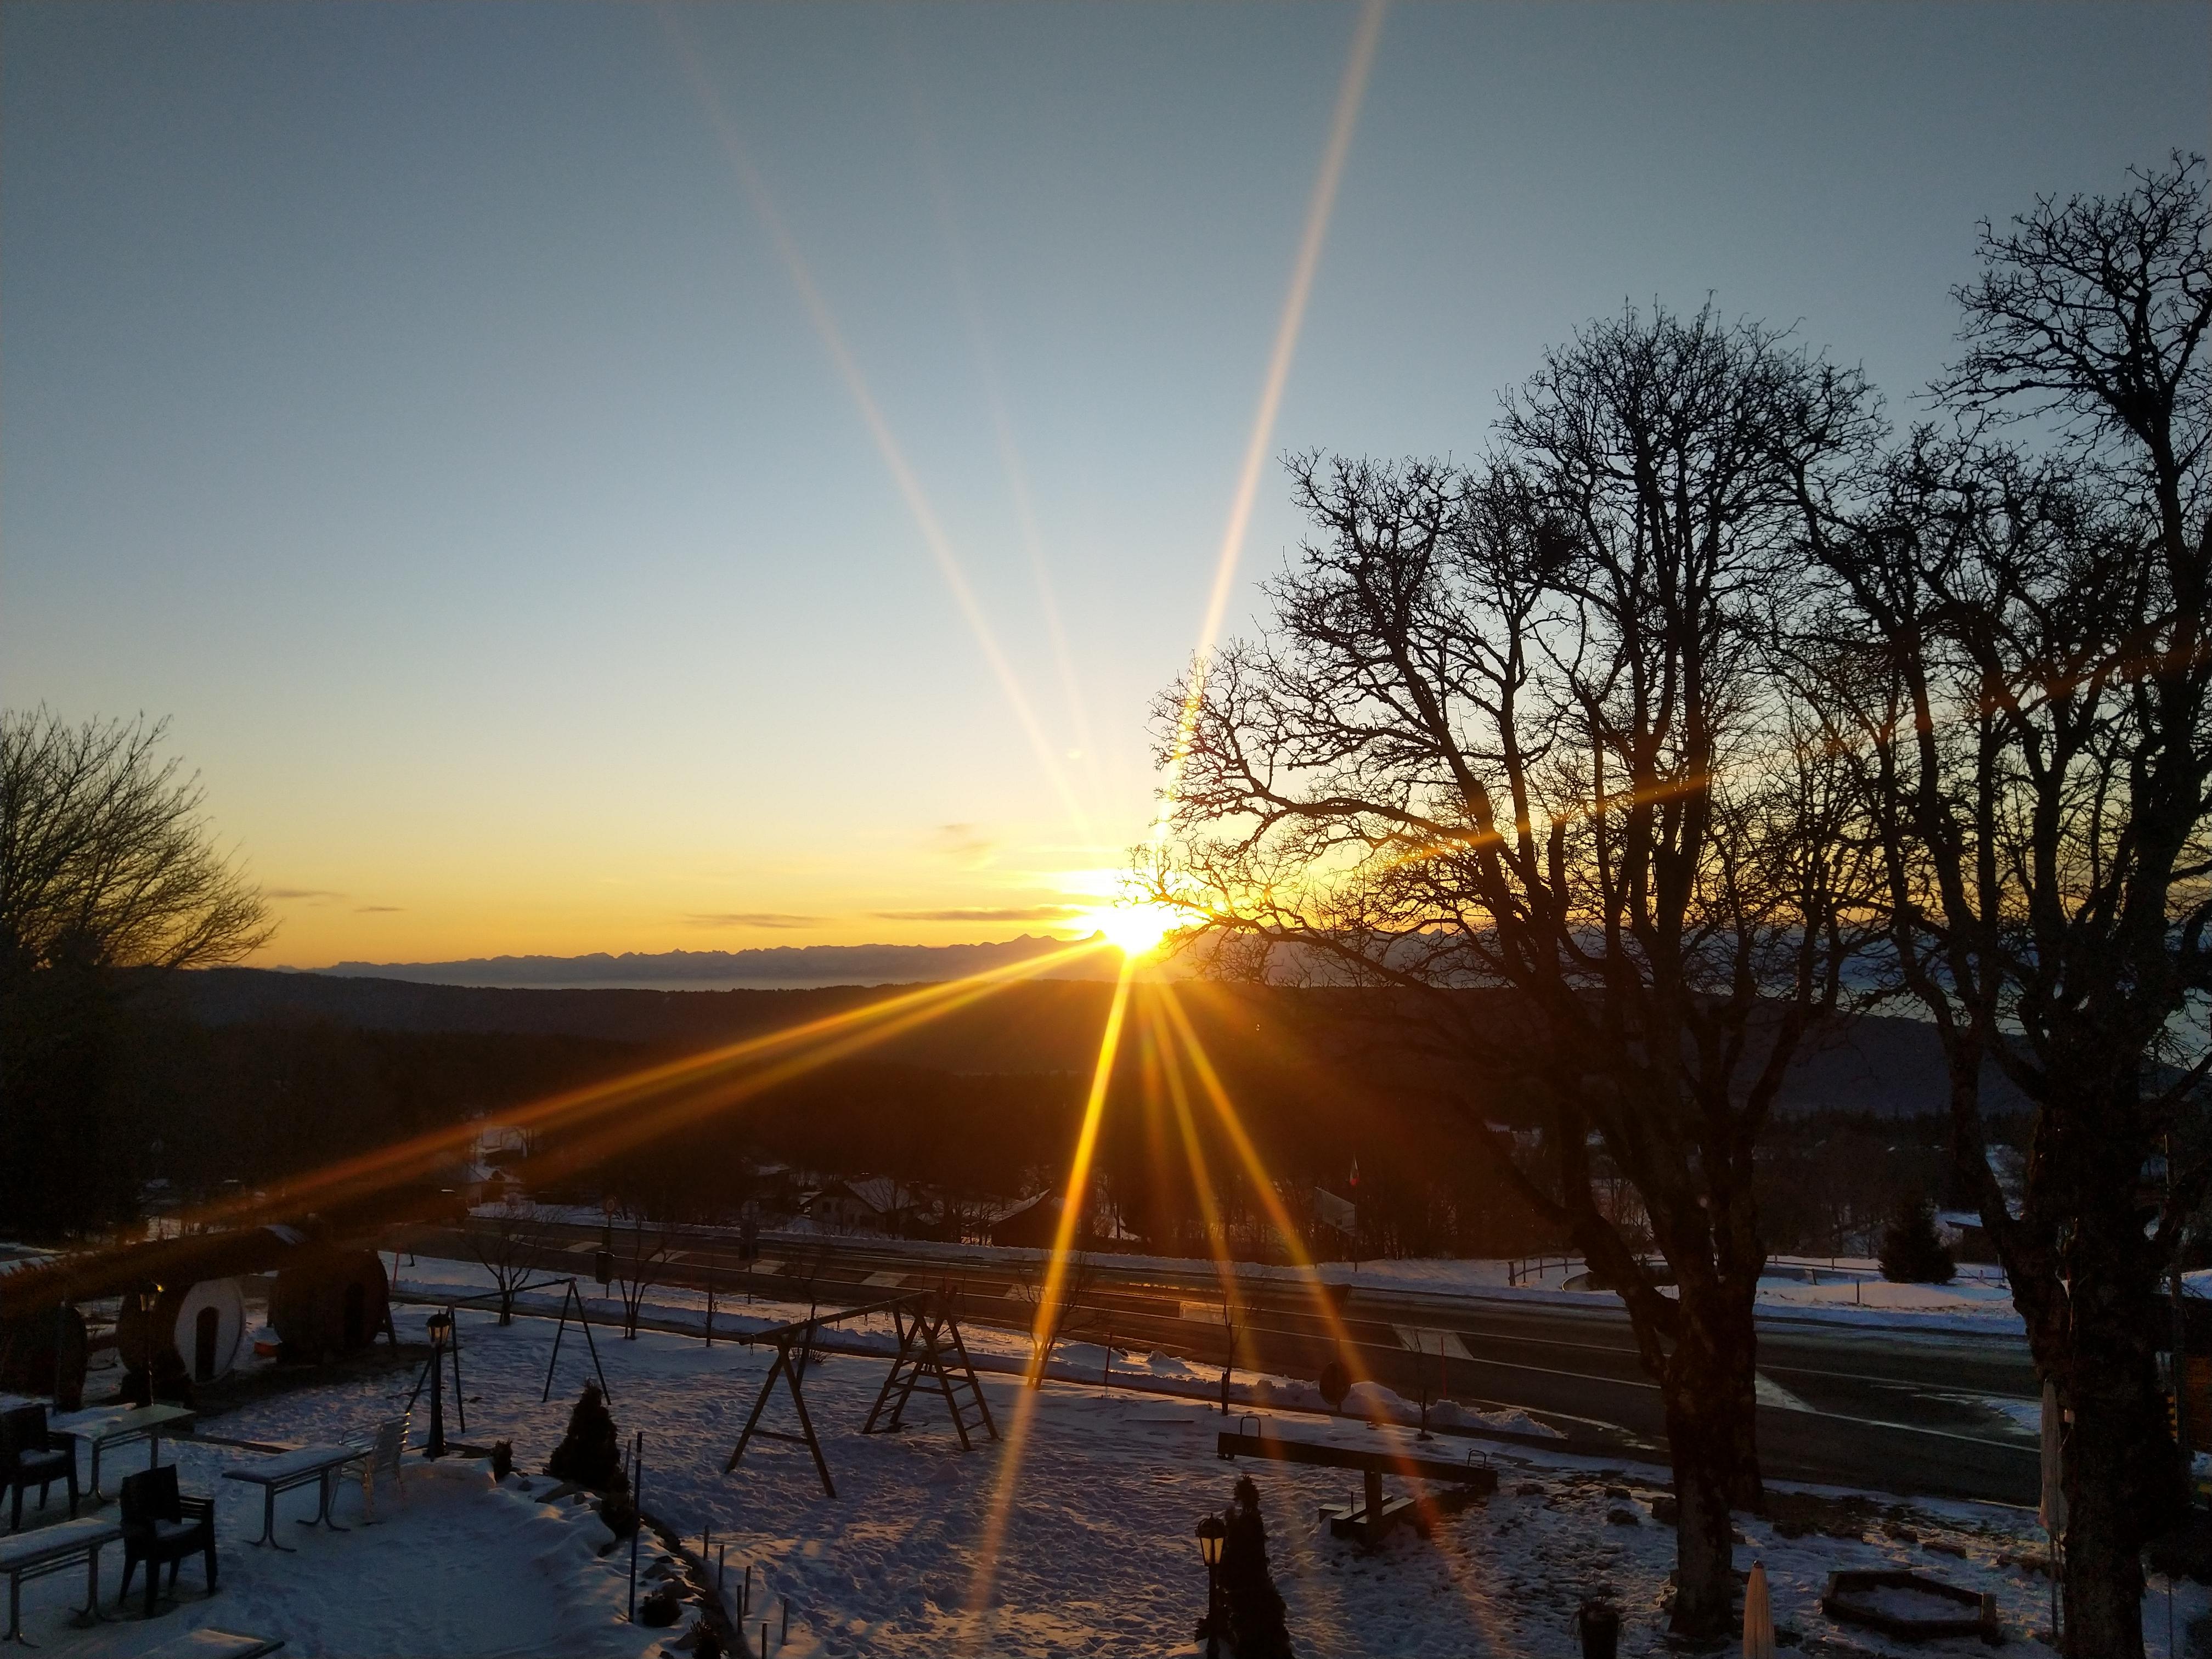 Sonnenaufgang am 2. Tag